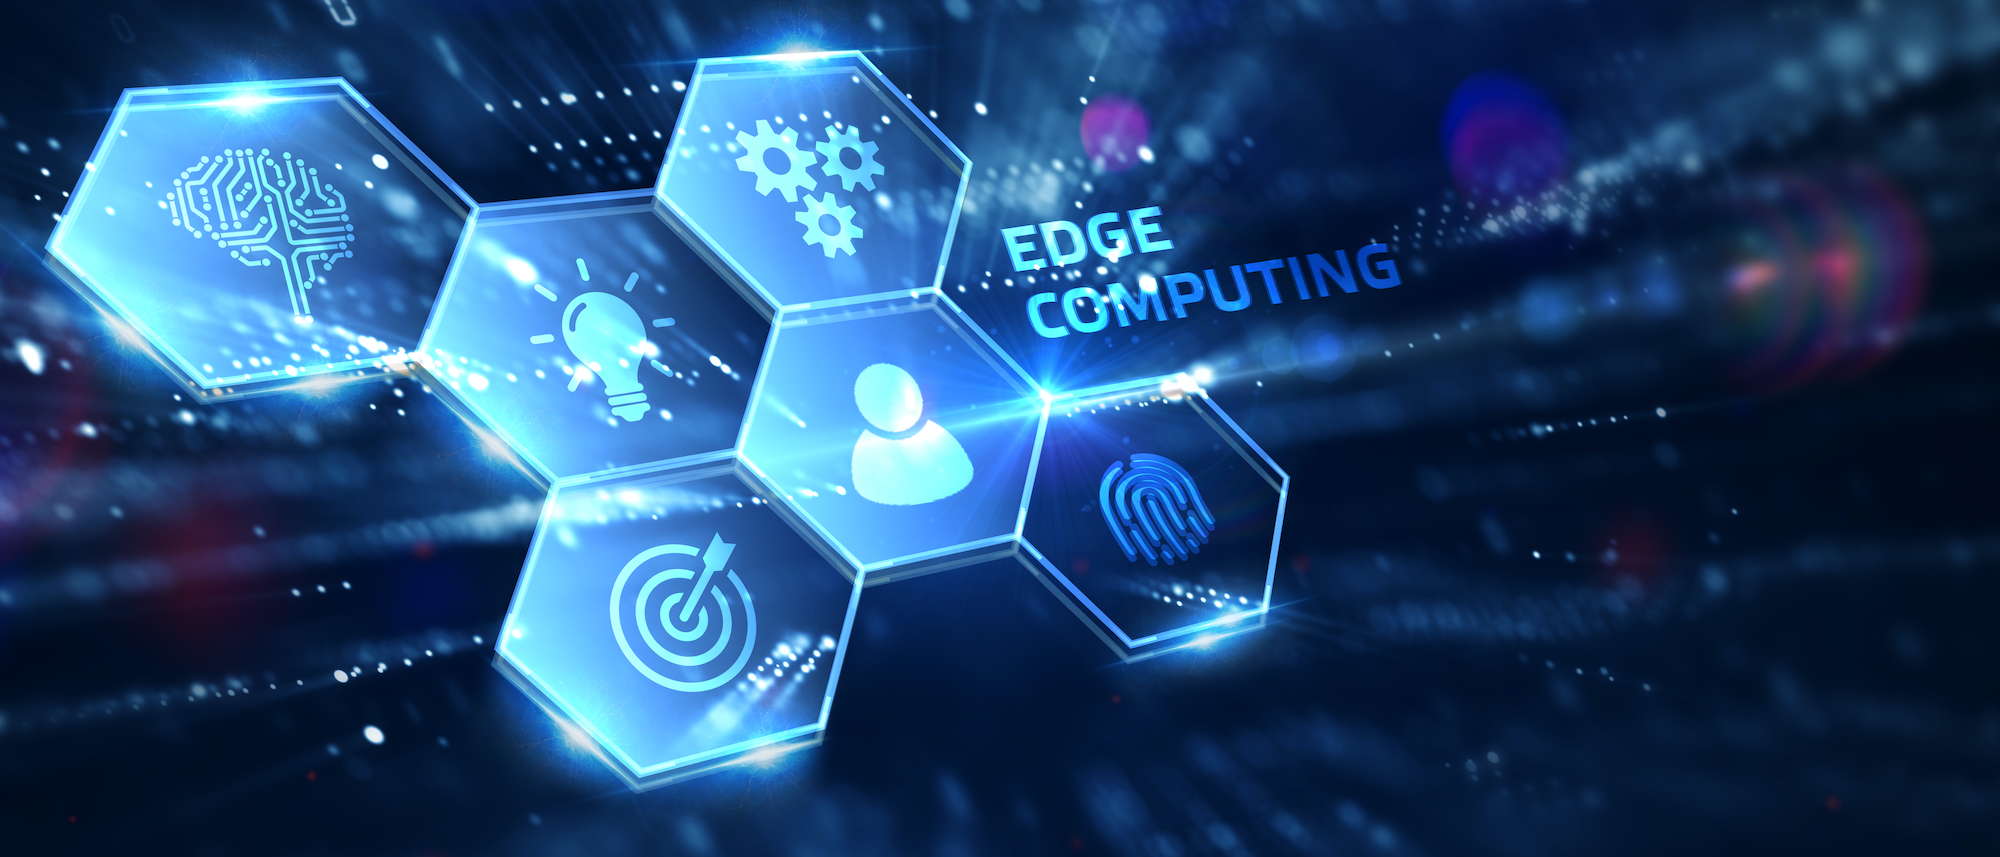 Secure Edge Computing